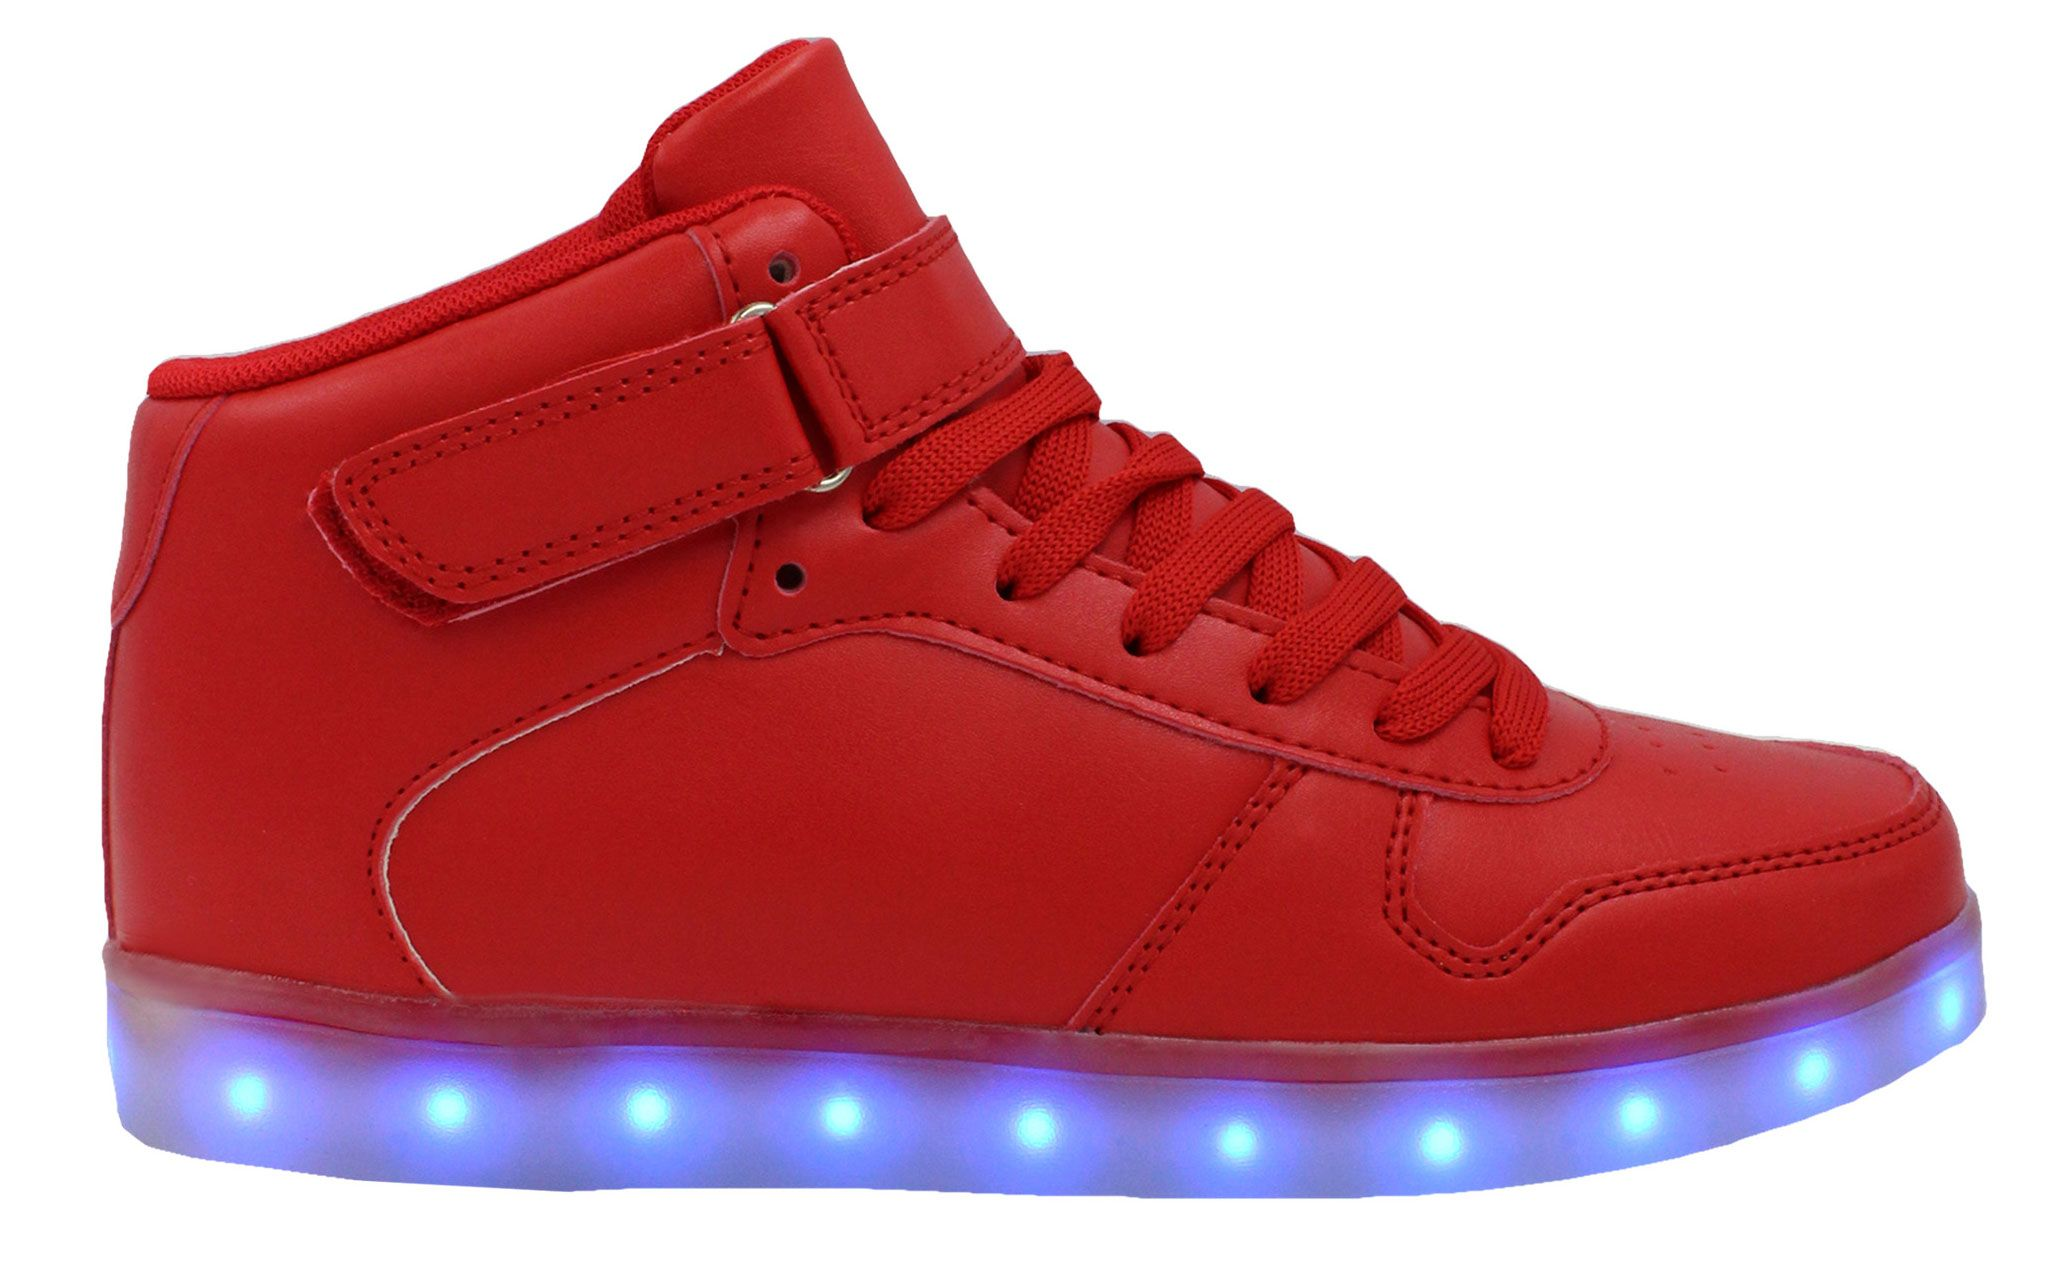 LED Light Up Sneakers Kids